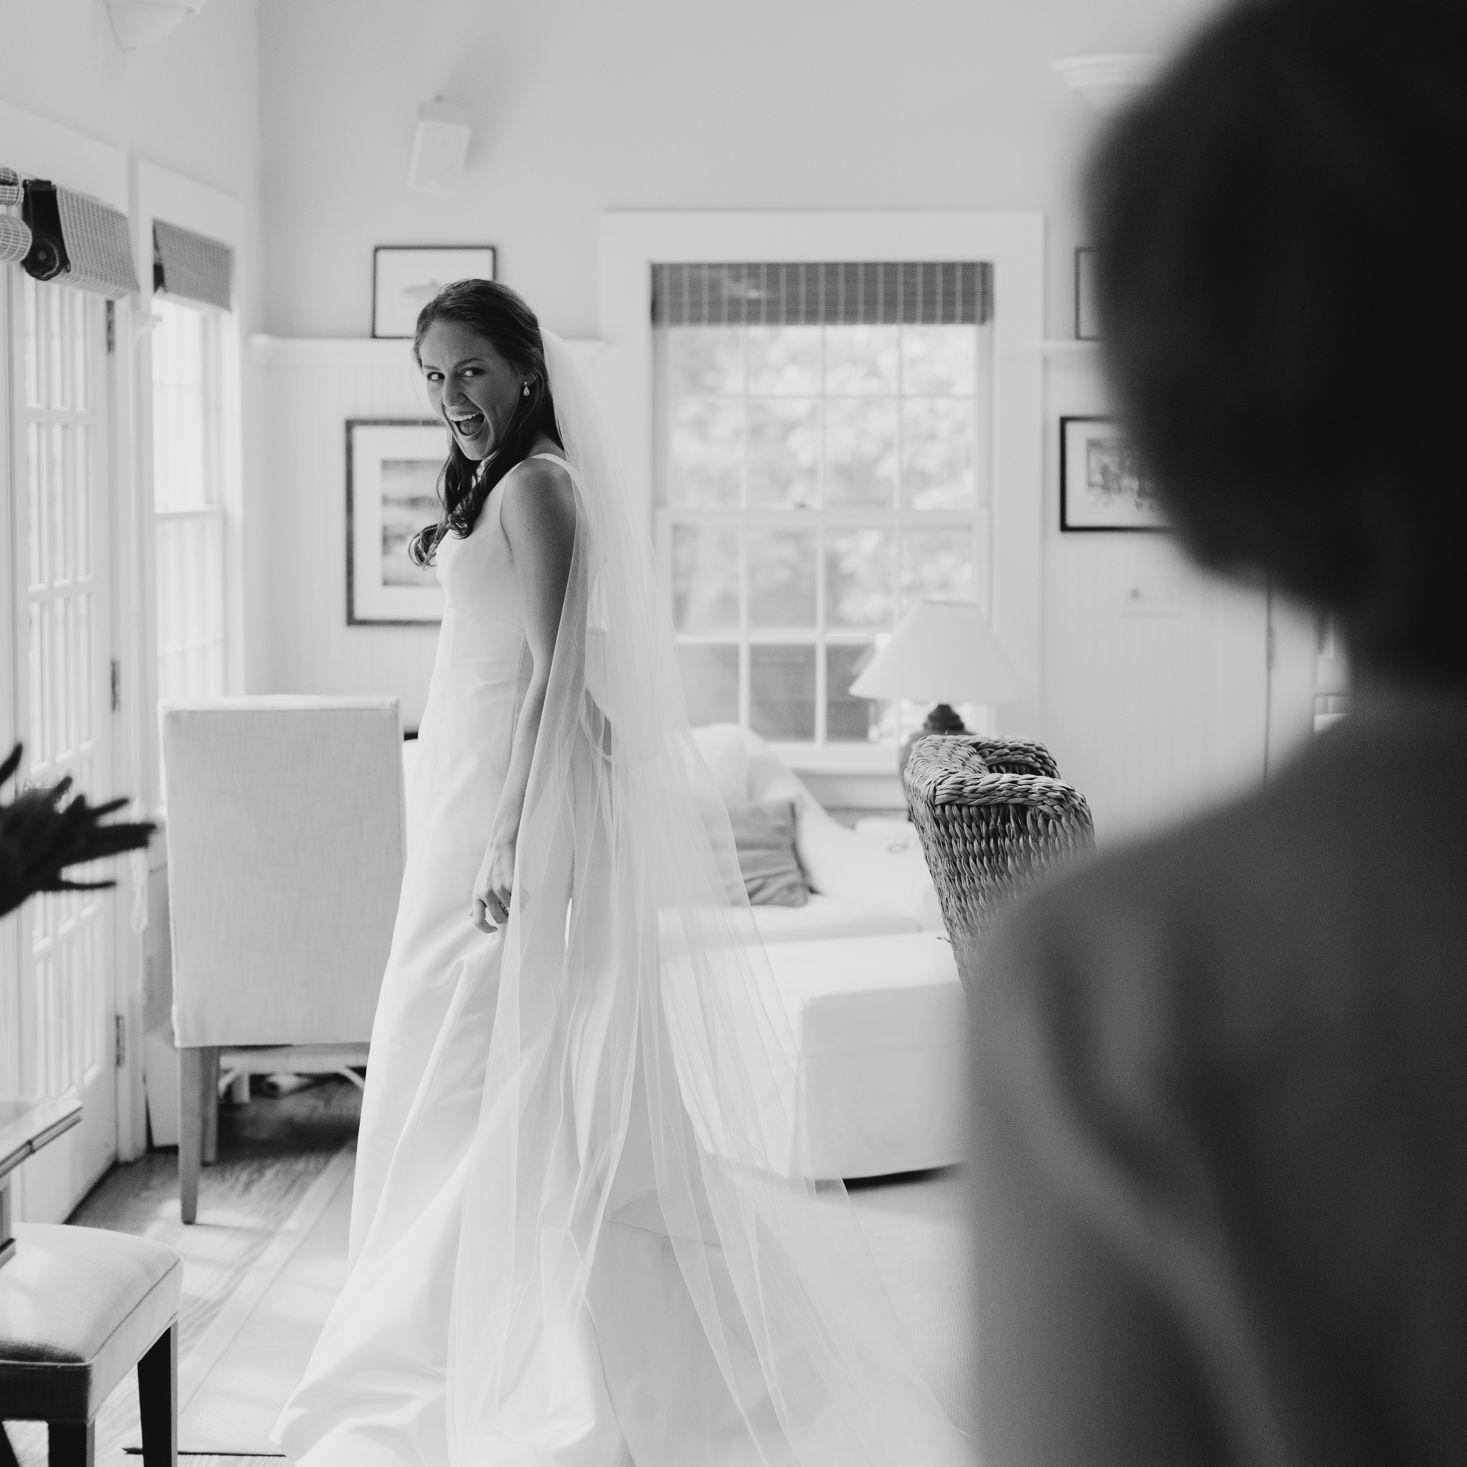 at-home rustic massachusetts wedding, bride posing in wedding dress